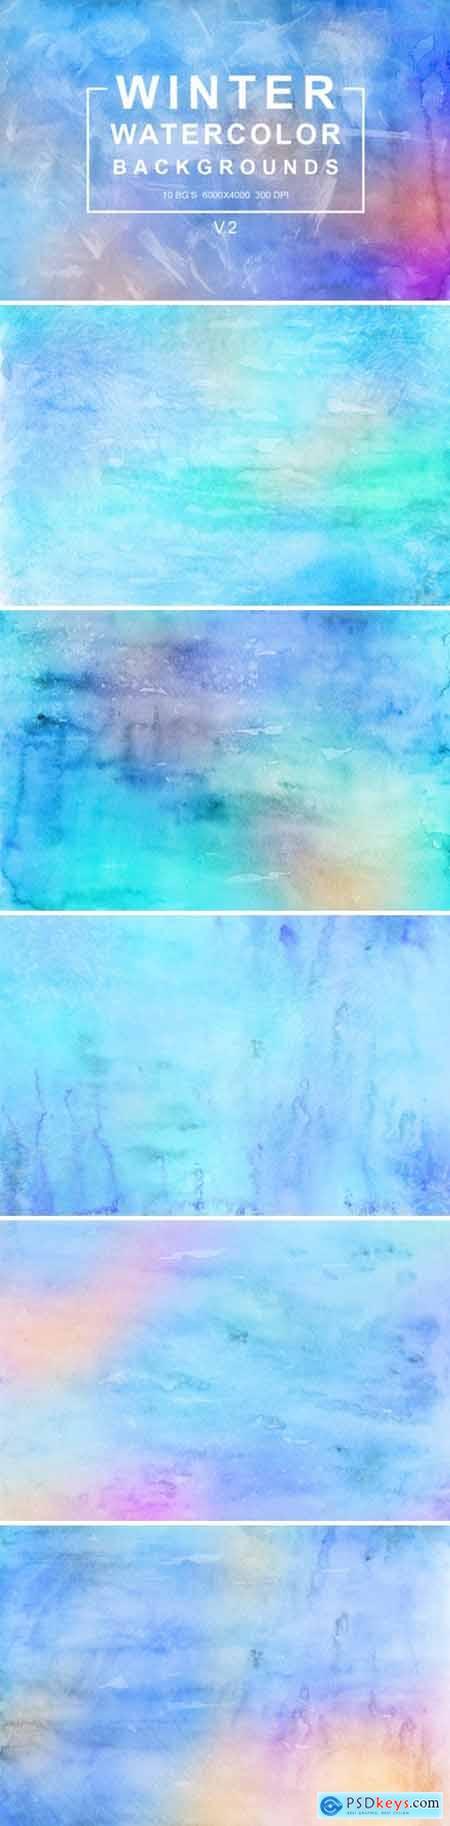 Winter Watercolor Backgrounds Vol.2